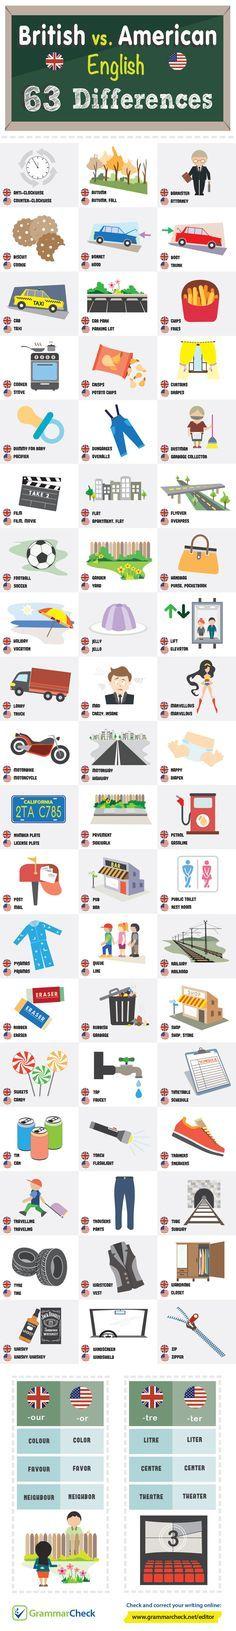 British vs. American English: 63 Differences